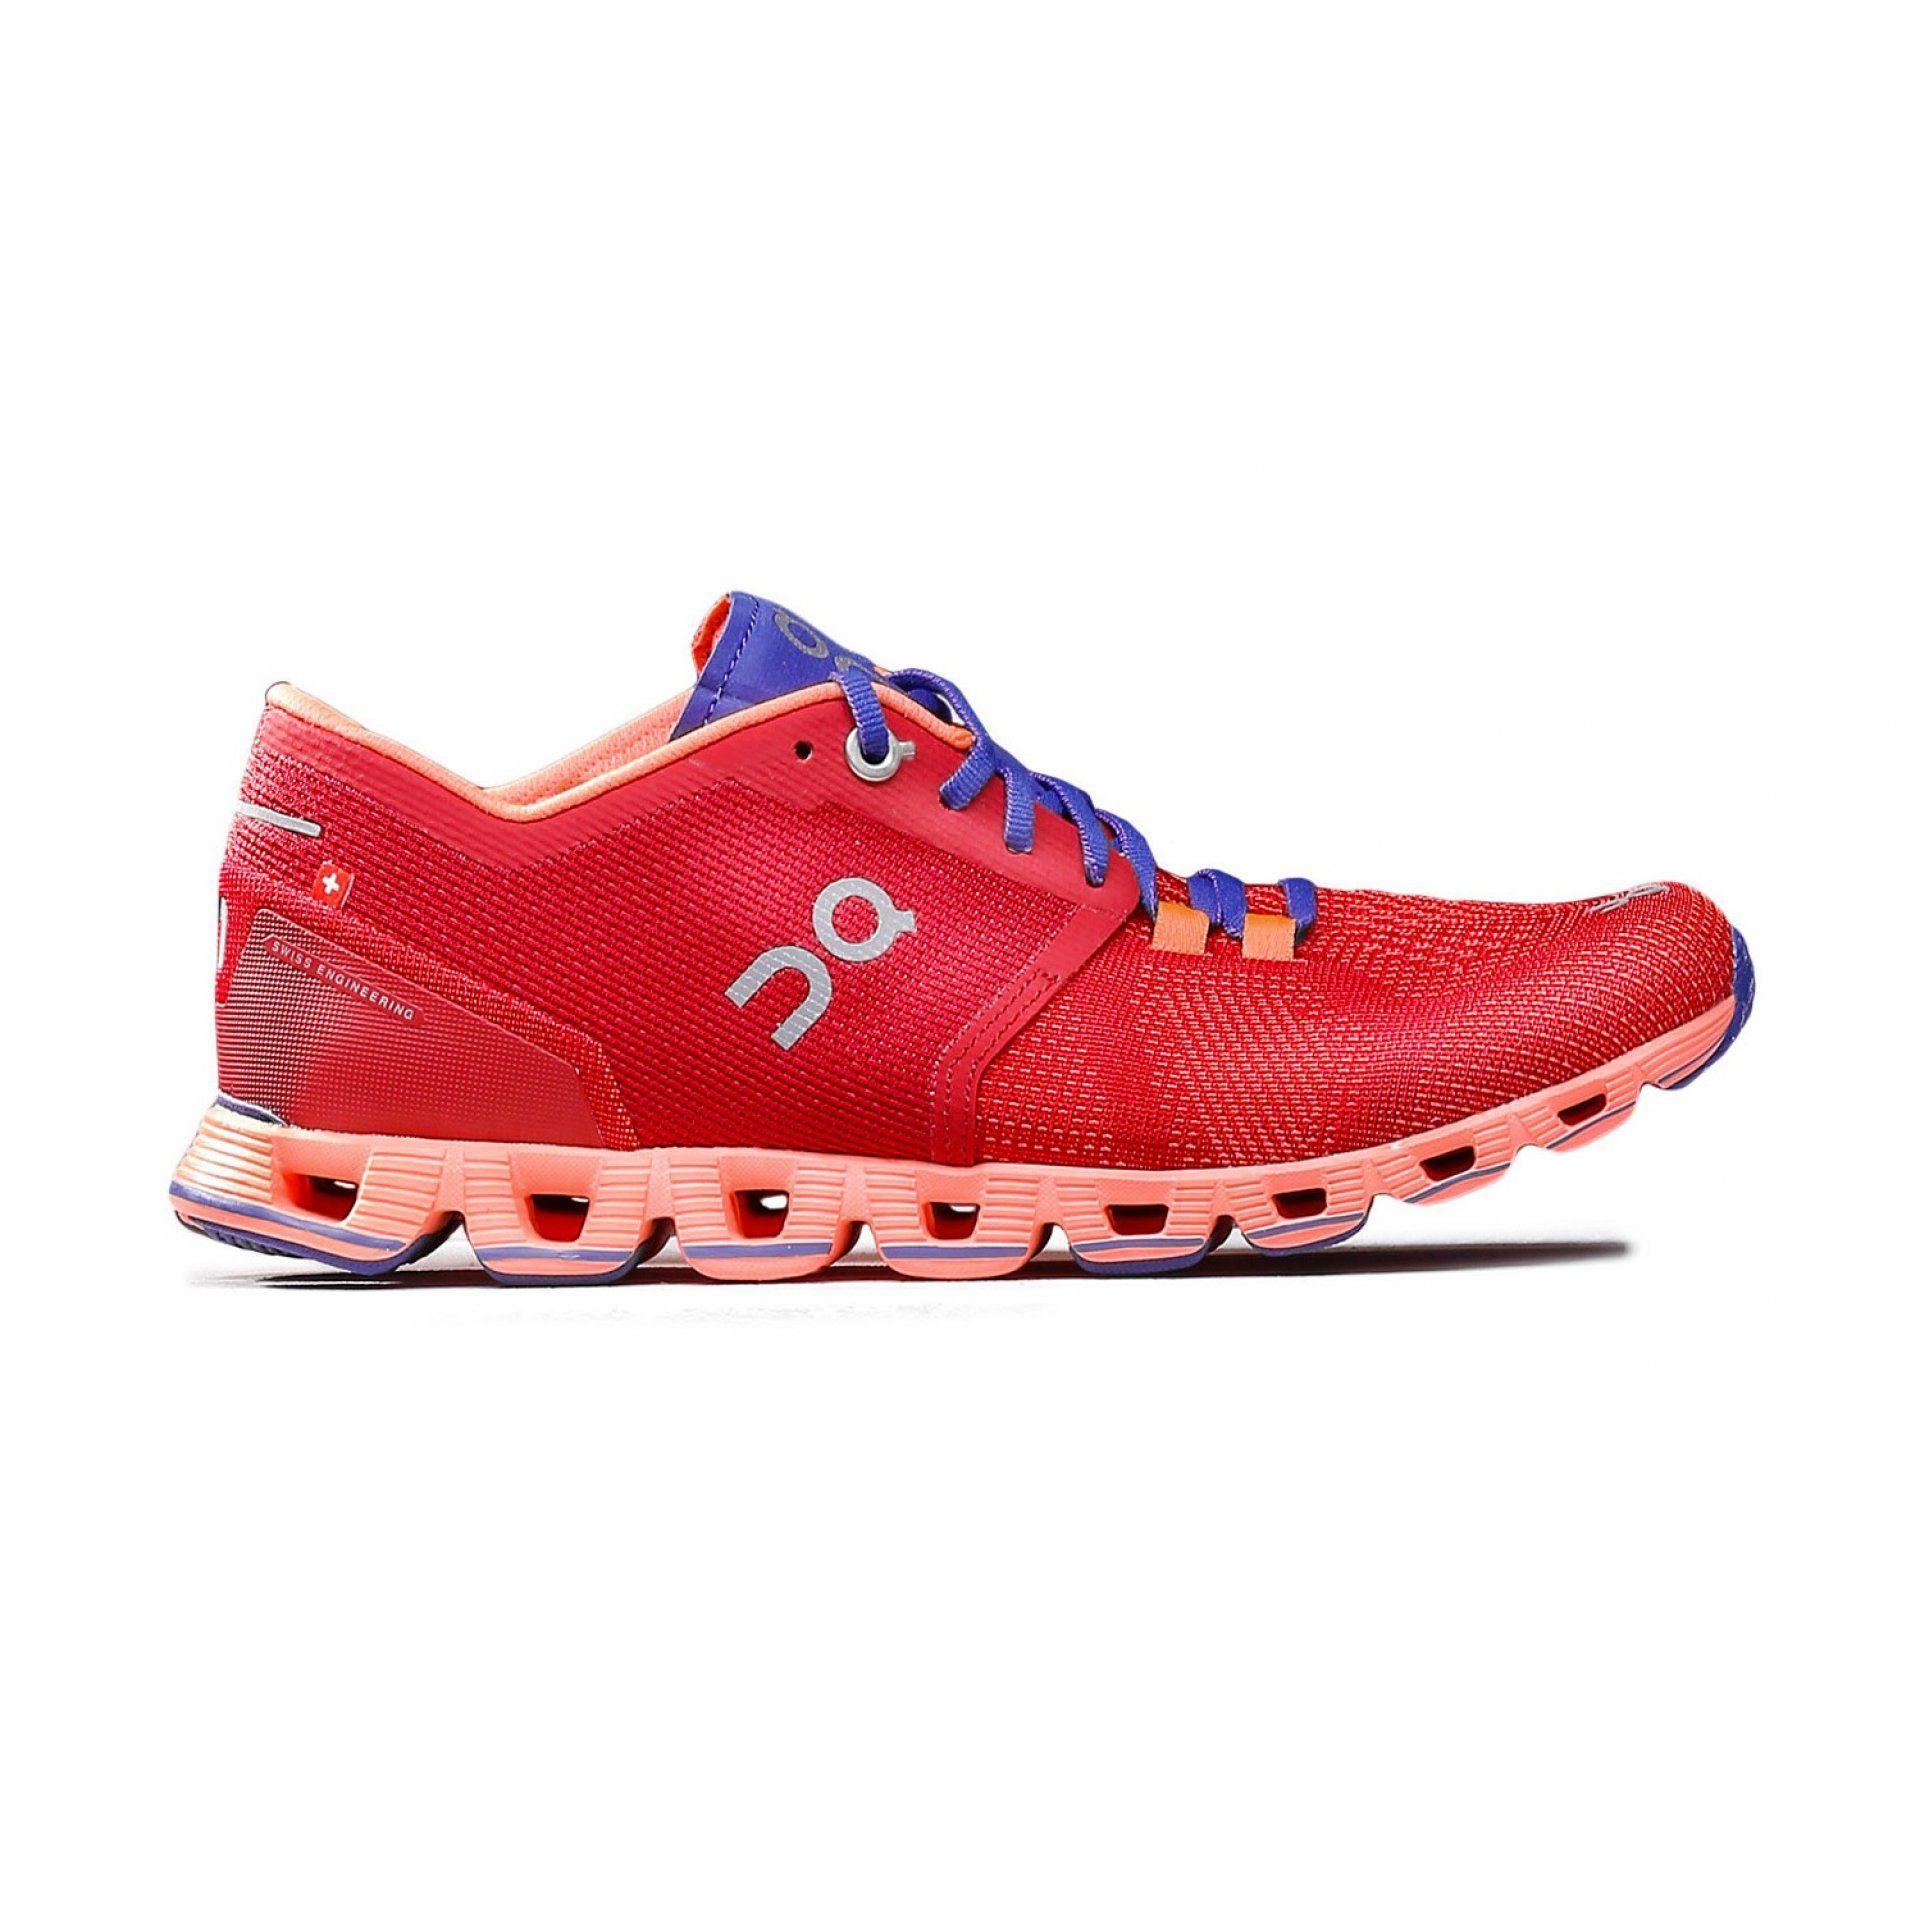 BUTY DO BIEGANIA ON RUNNING CLOUD X W RED FLASH